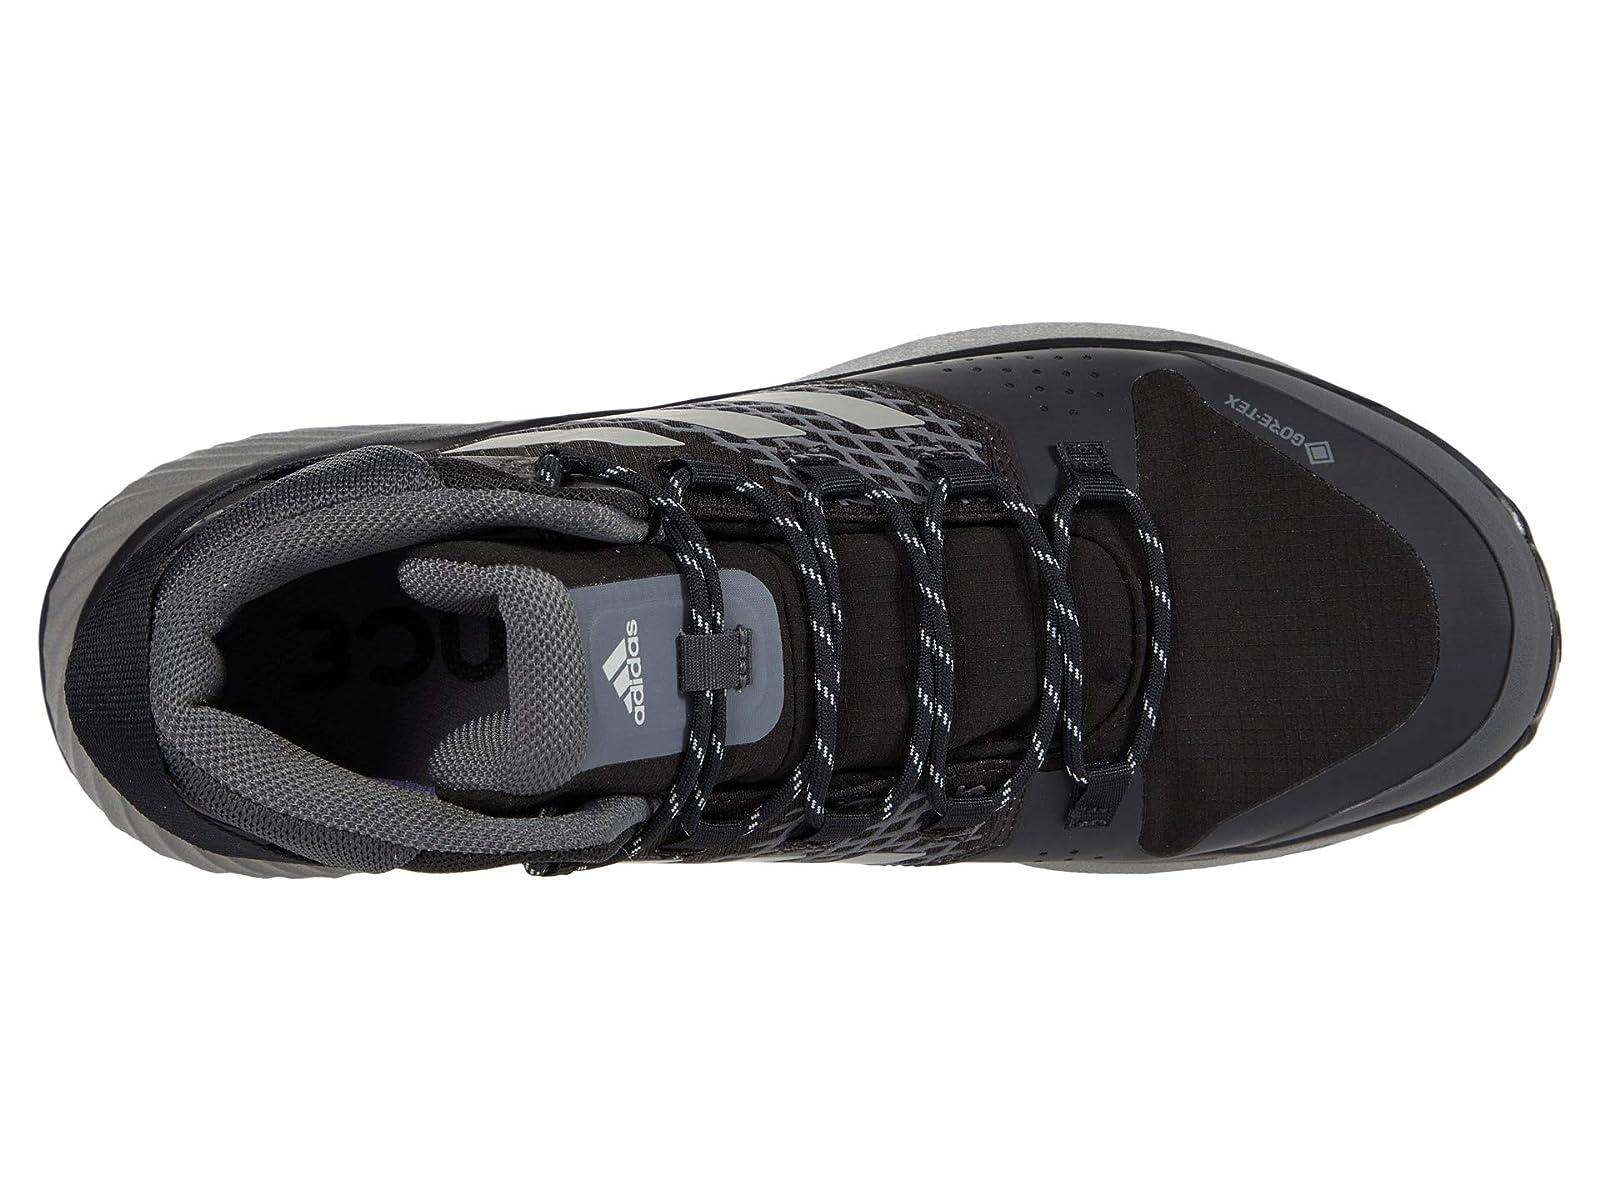 Mannes-Schuhe-Adidas-Outdoor-TERREX-folgian-Hiker-Mid-GTX Indexbild 3